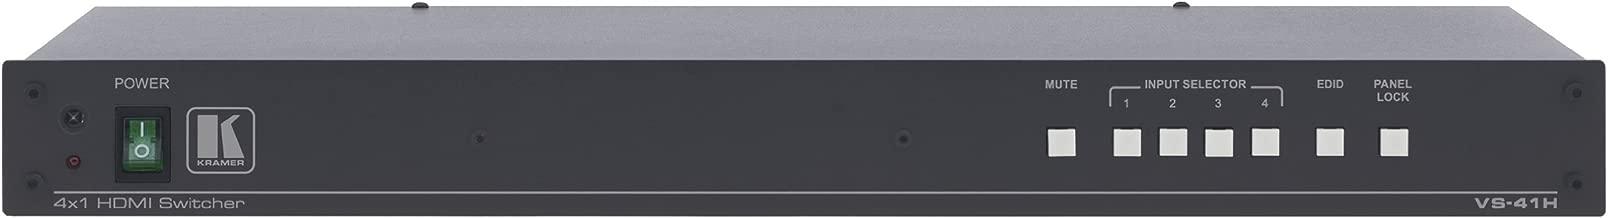 Kramer High Performance 4x1 HDMI Switcher VS-41H